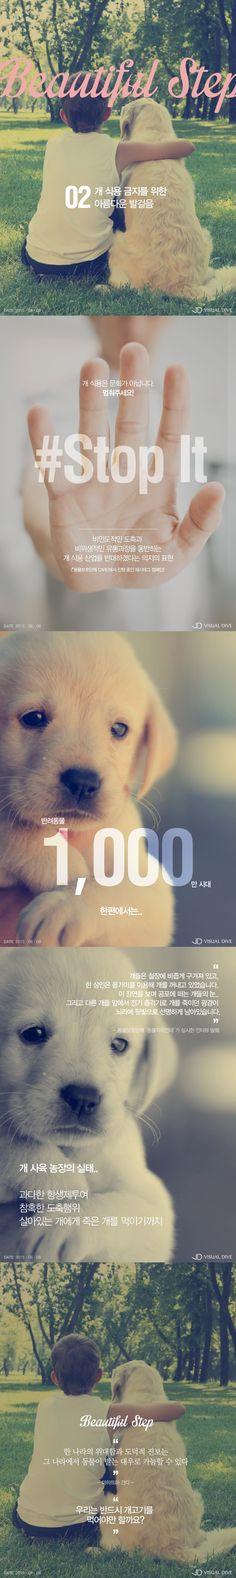 [Beautiful Step] 우리는 반드시 개고기를 먹어야만 할까요? [카드뉴스] #Dog_meat / #Infographic ⓒ 비주얼다이브 무단 복사·전재·재배포 금지